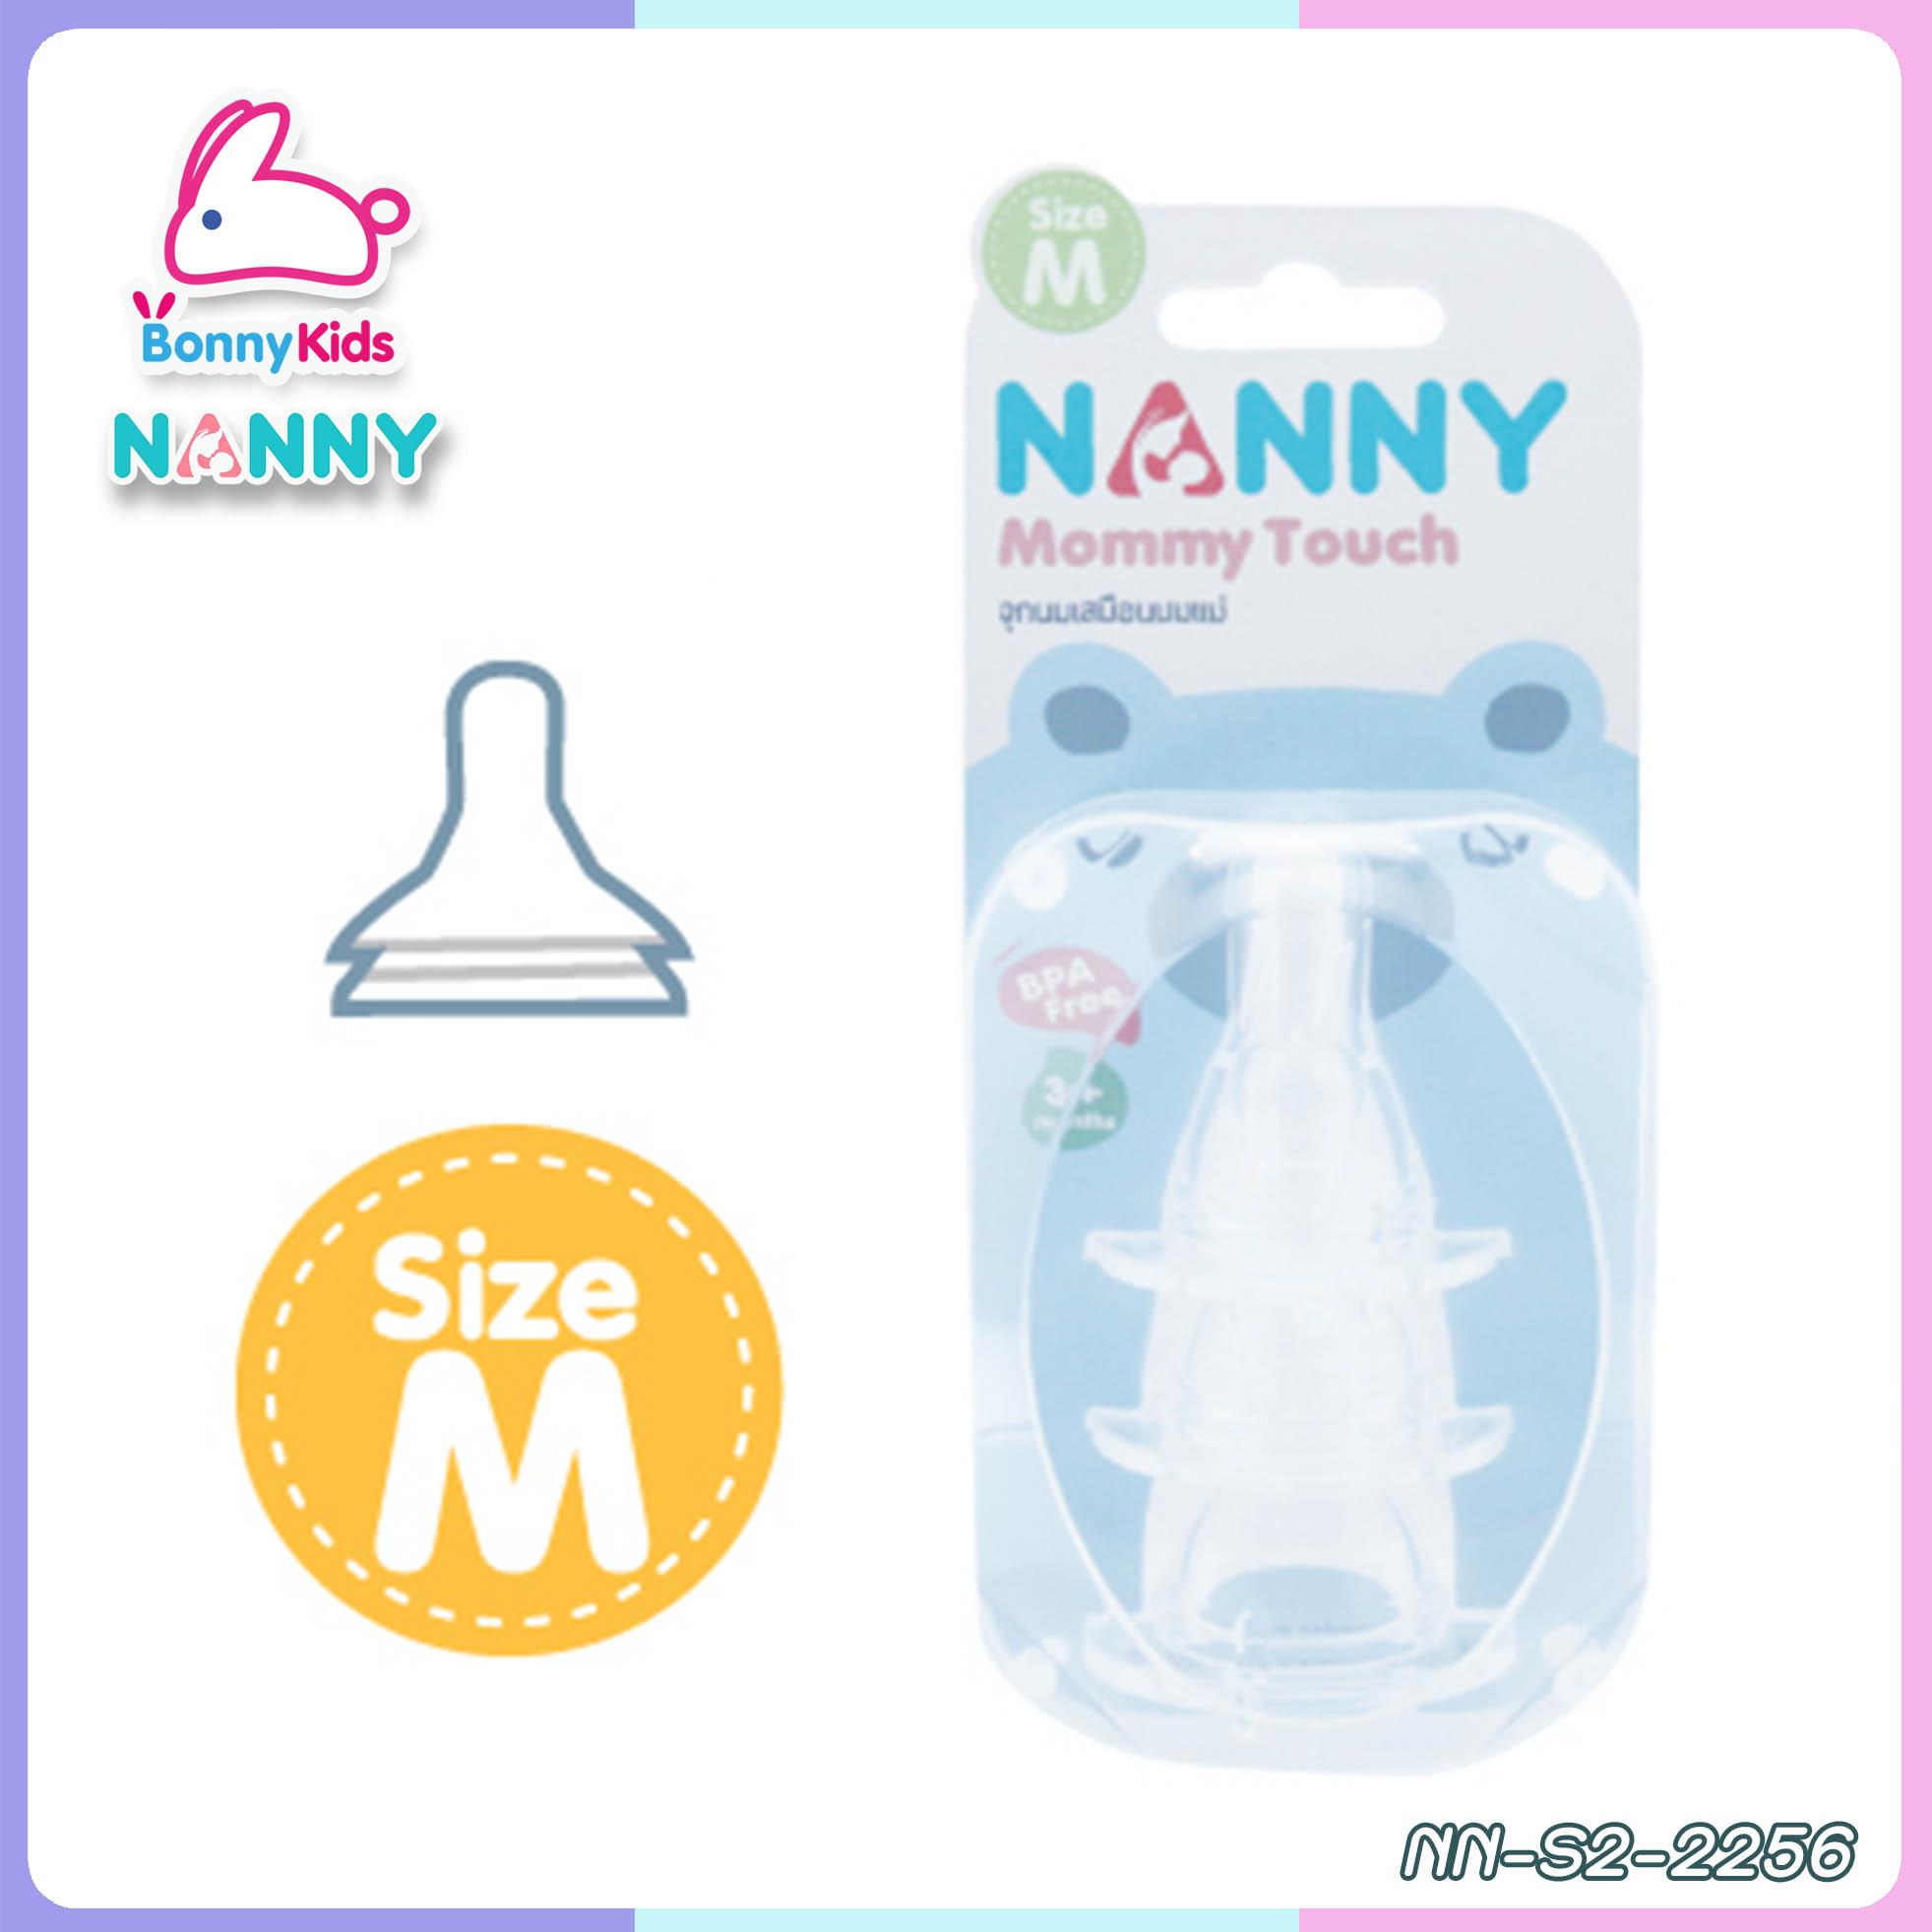 nanny แนนนี่จุกนมซิลิโคนเสมือนนมมารดา ไซส์ M แพ็ค3